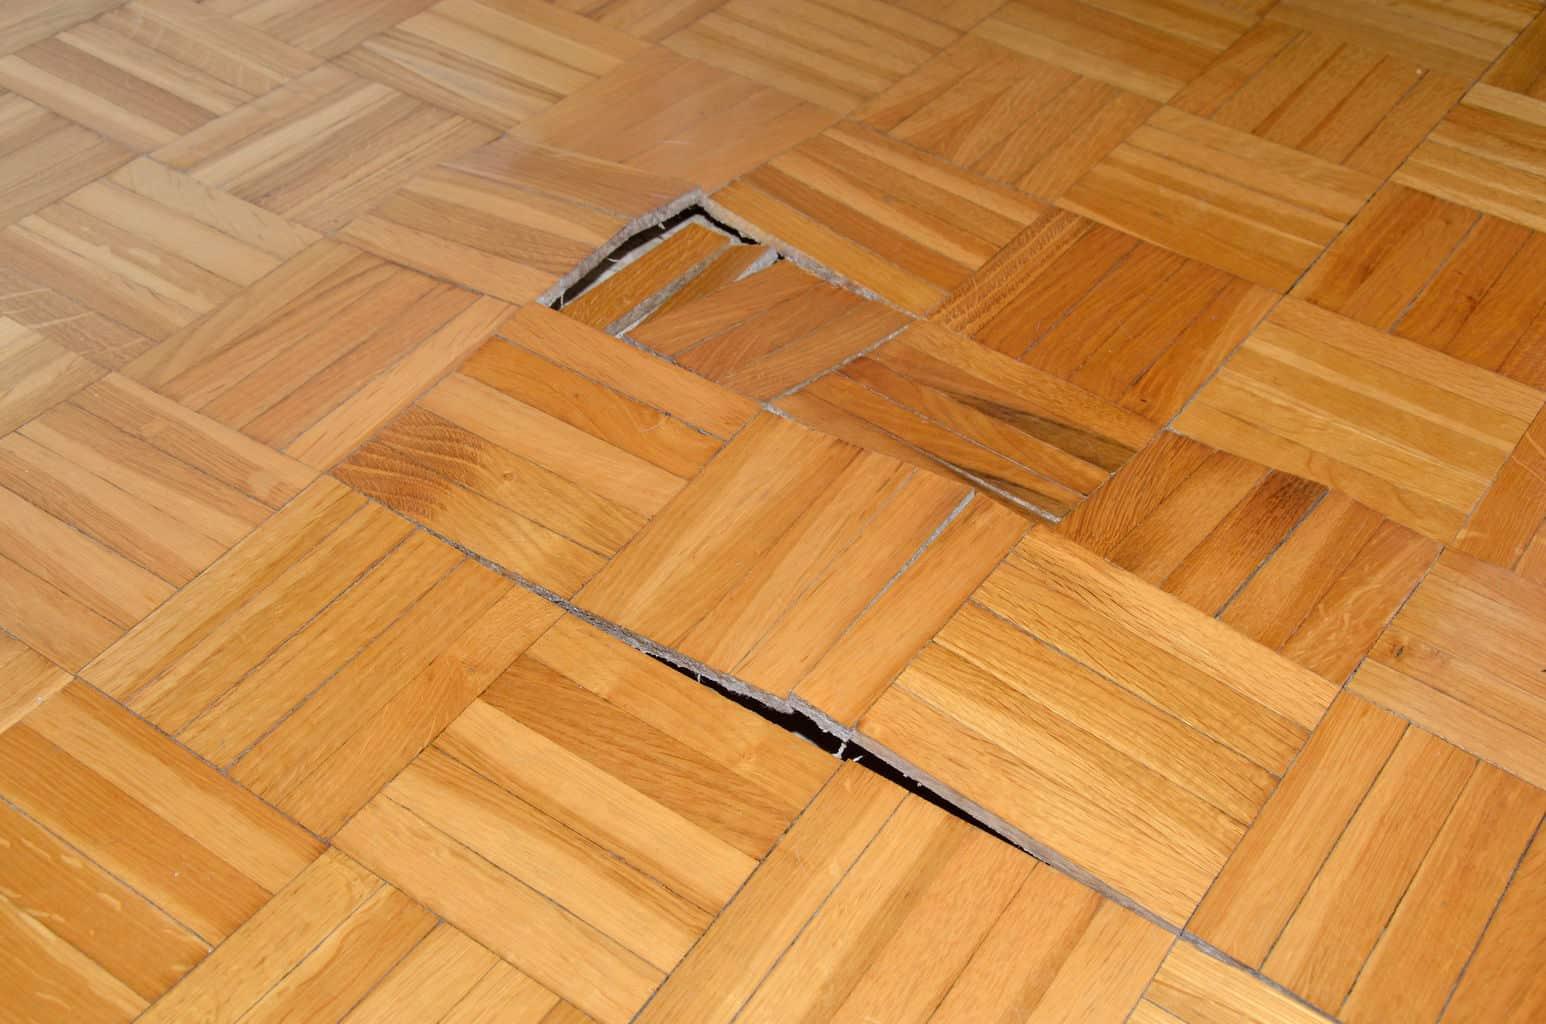 Restoring Hardwood Floors In One Day Theflooringlady